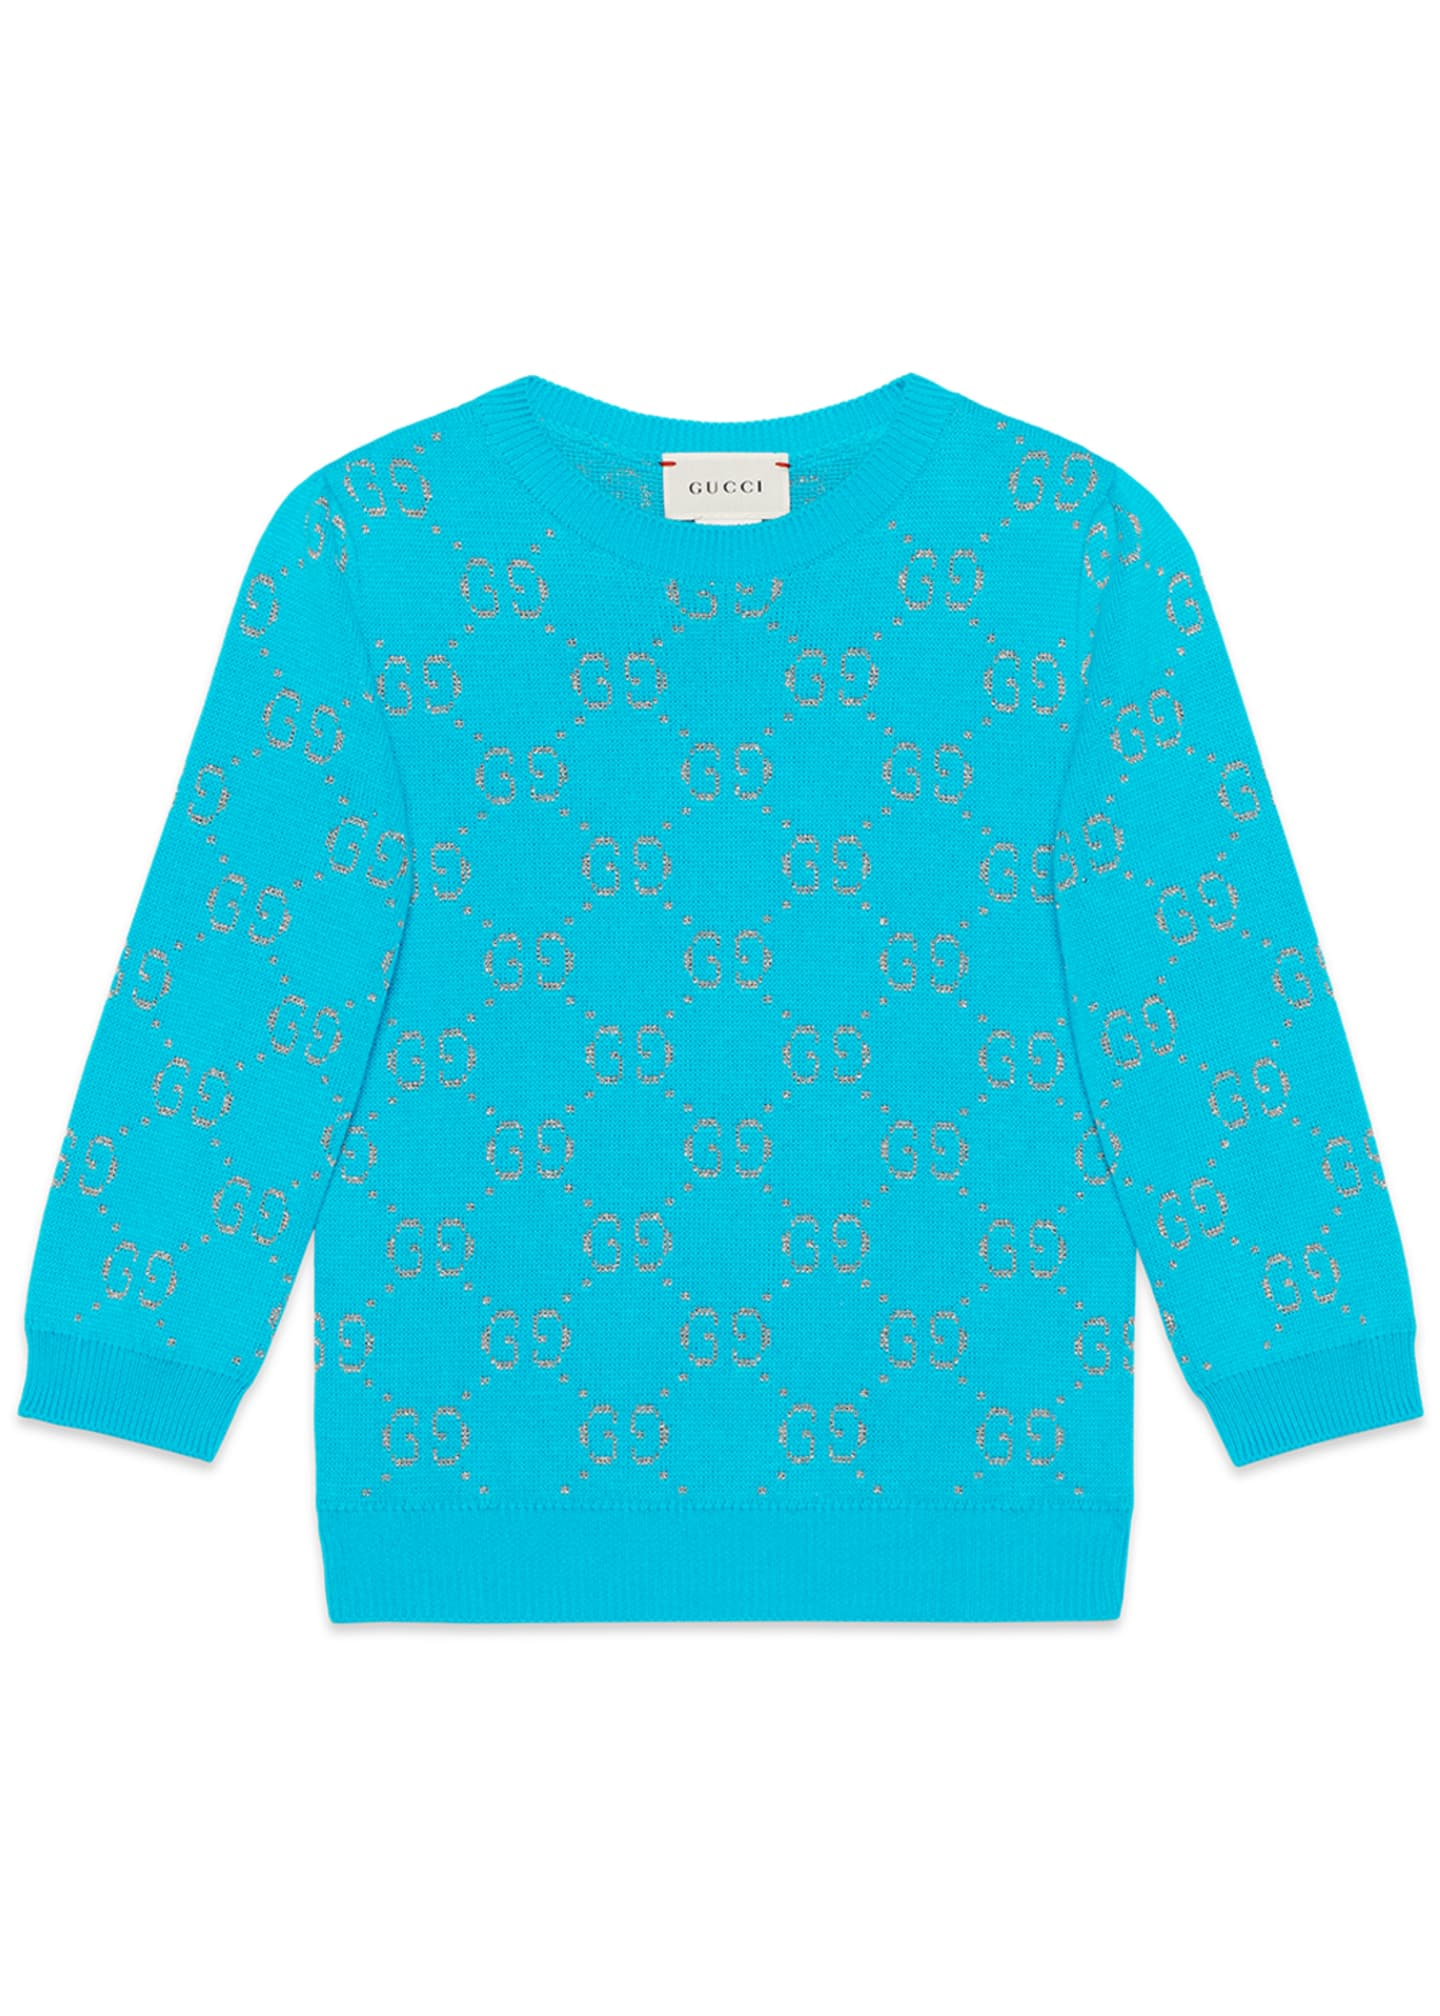 Gucci Girls' GG Printed 3/4-Sleeve Crewneck Sweater, Size